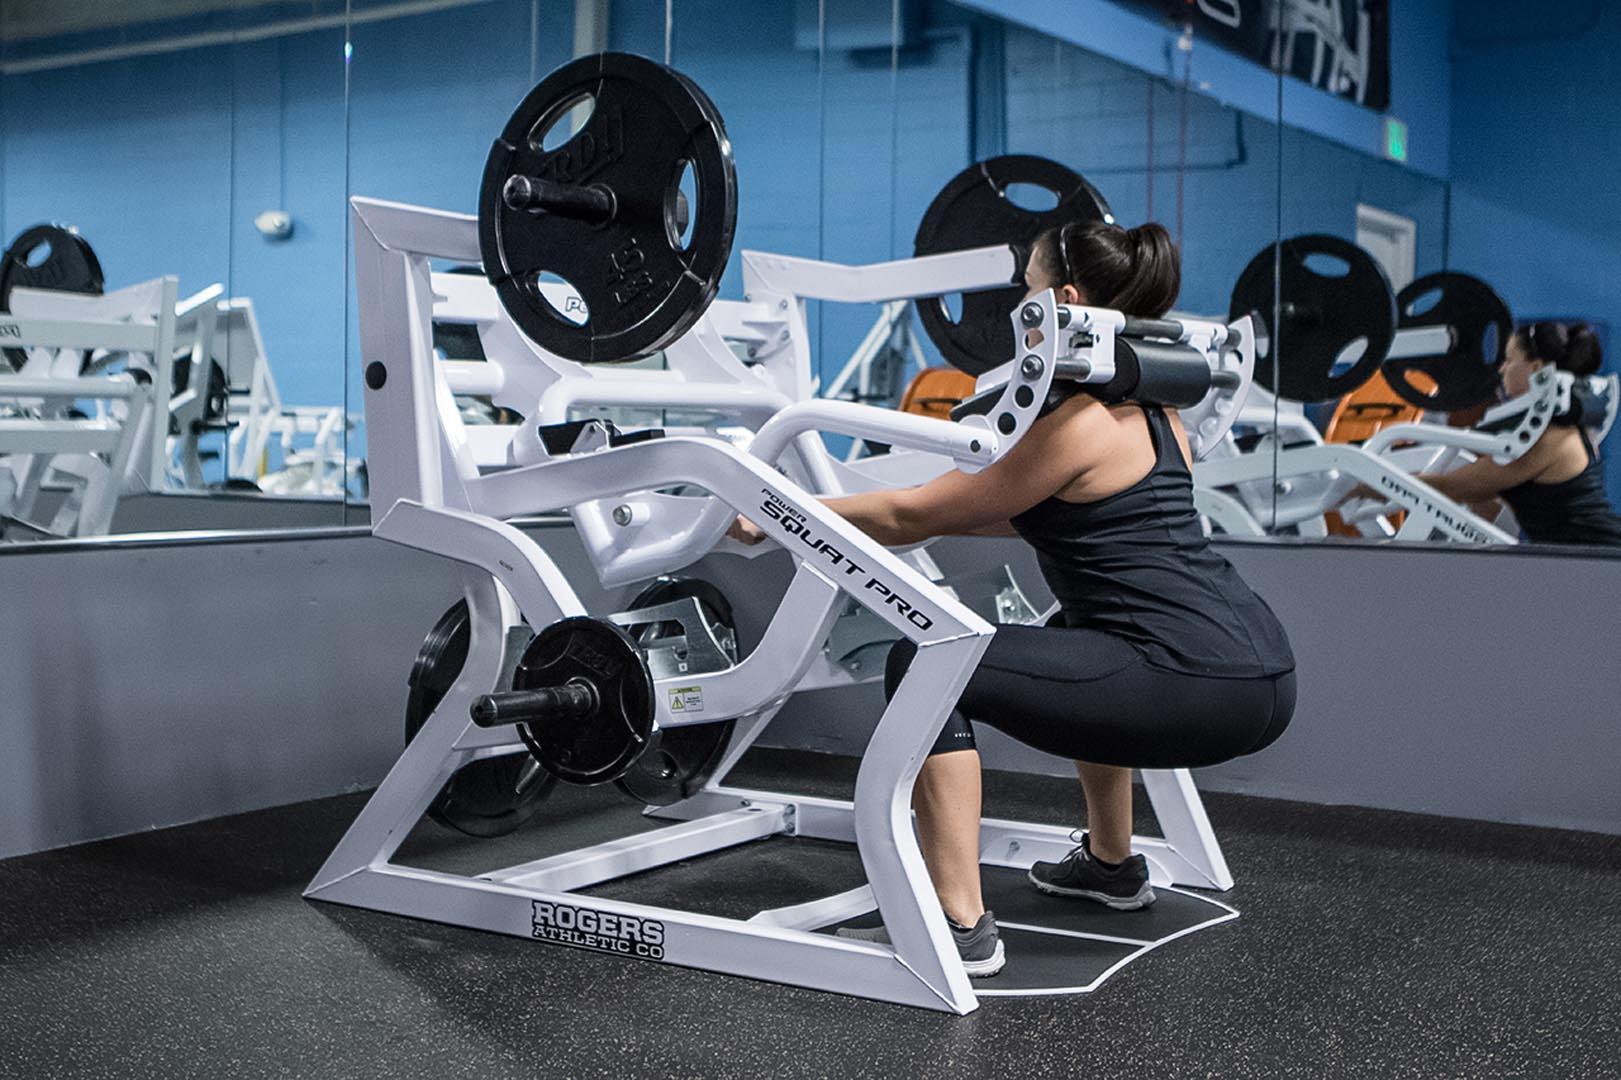 410605_power_squat_pro_022.jpg